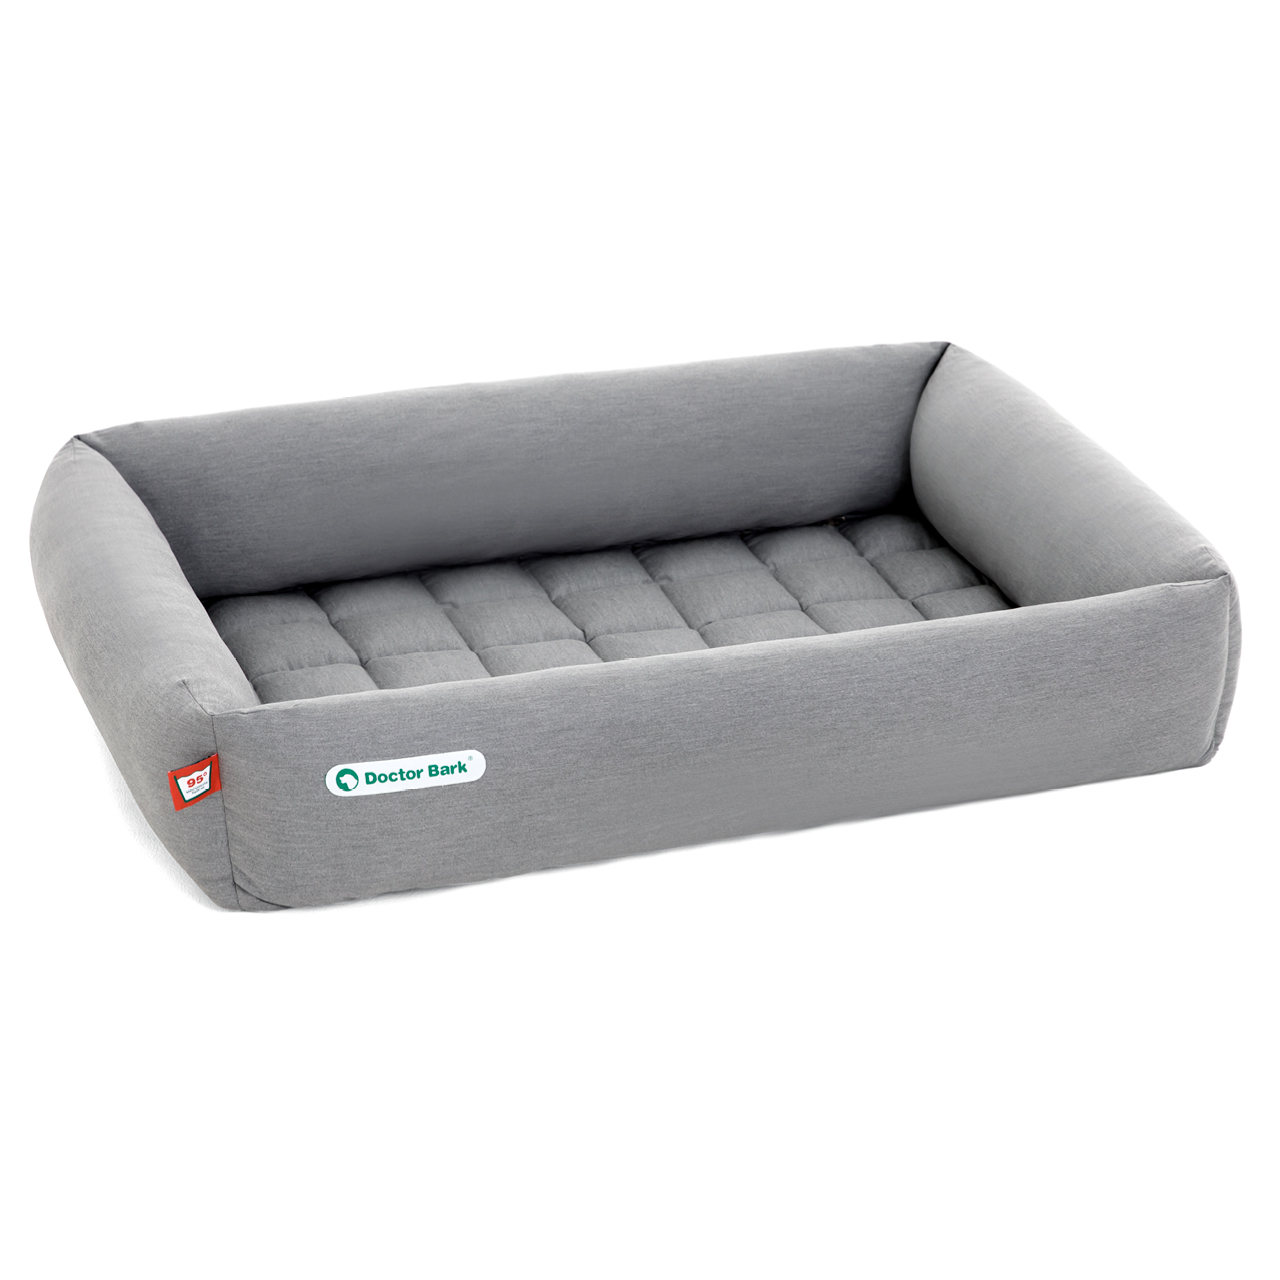 SET Bett + Einlegedecke hellgrau L